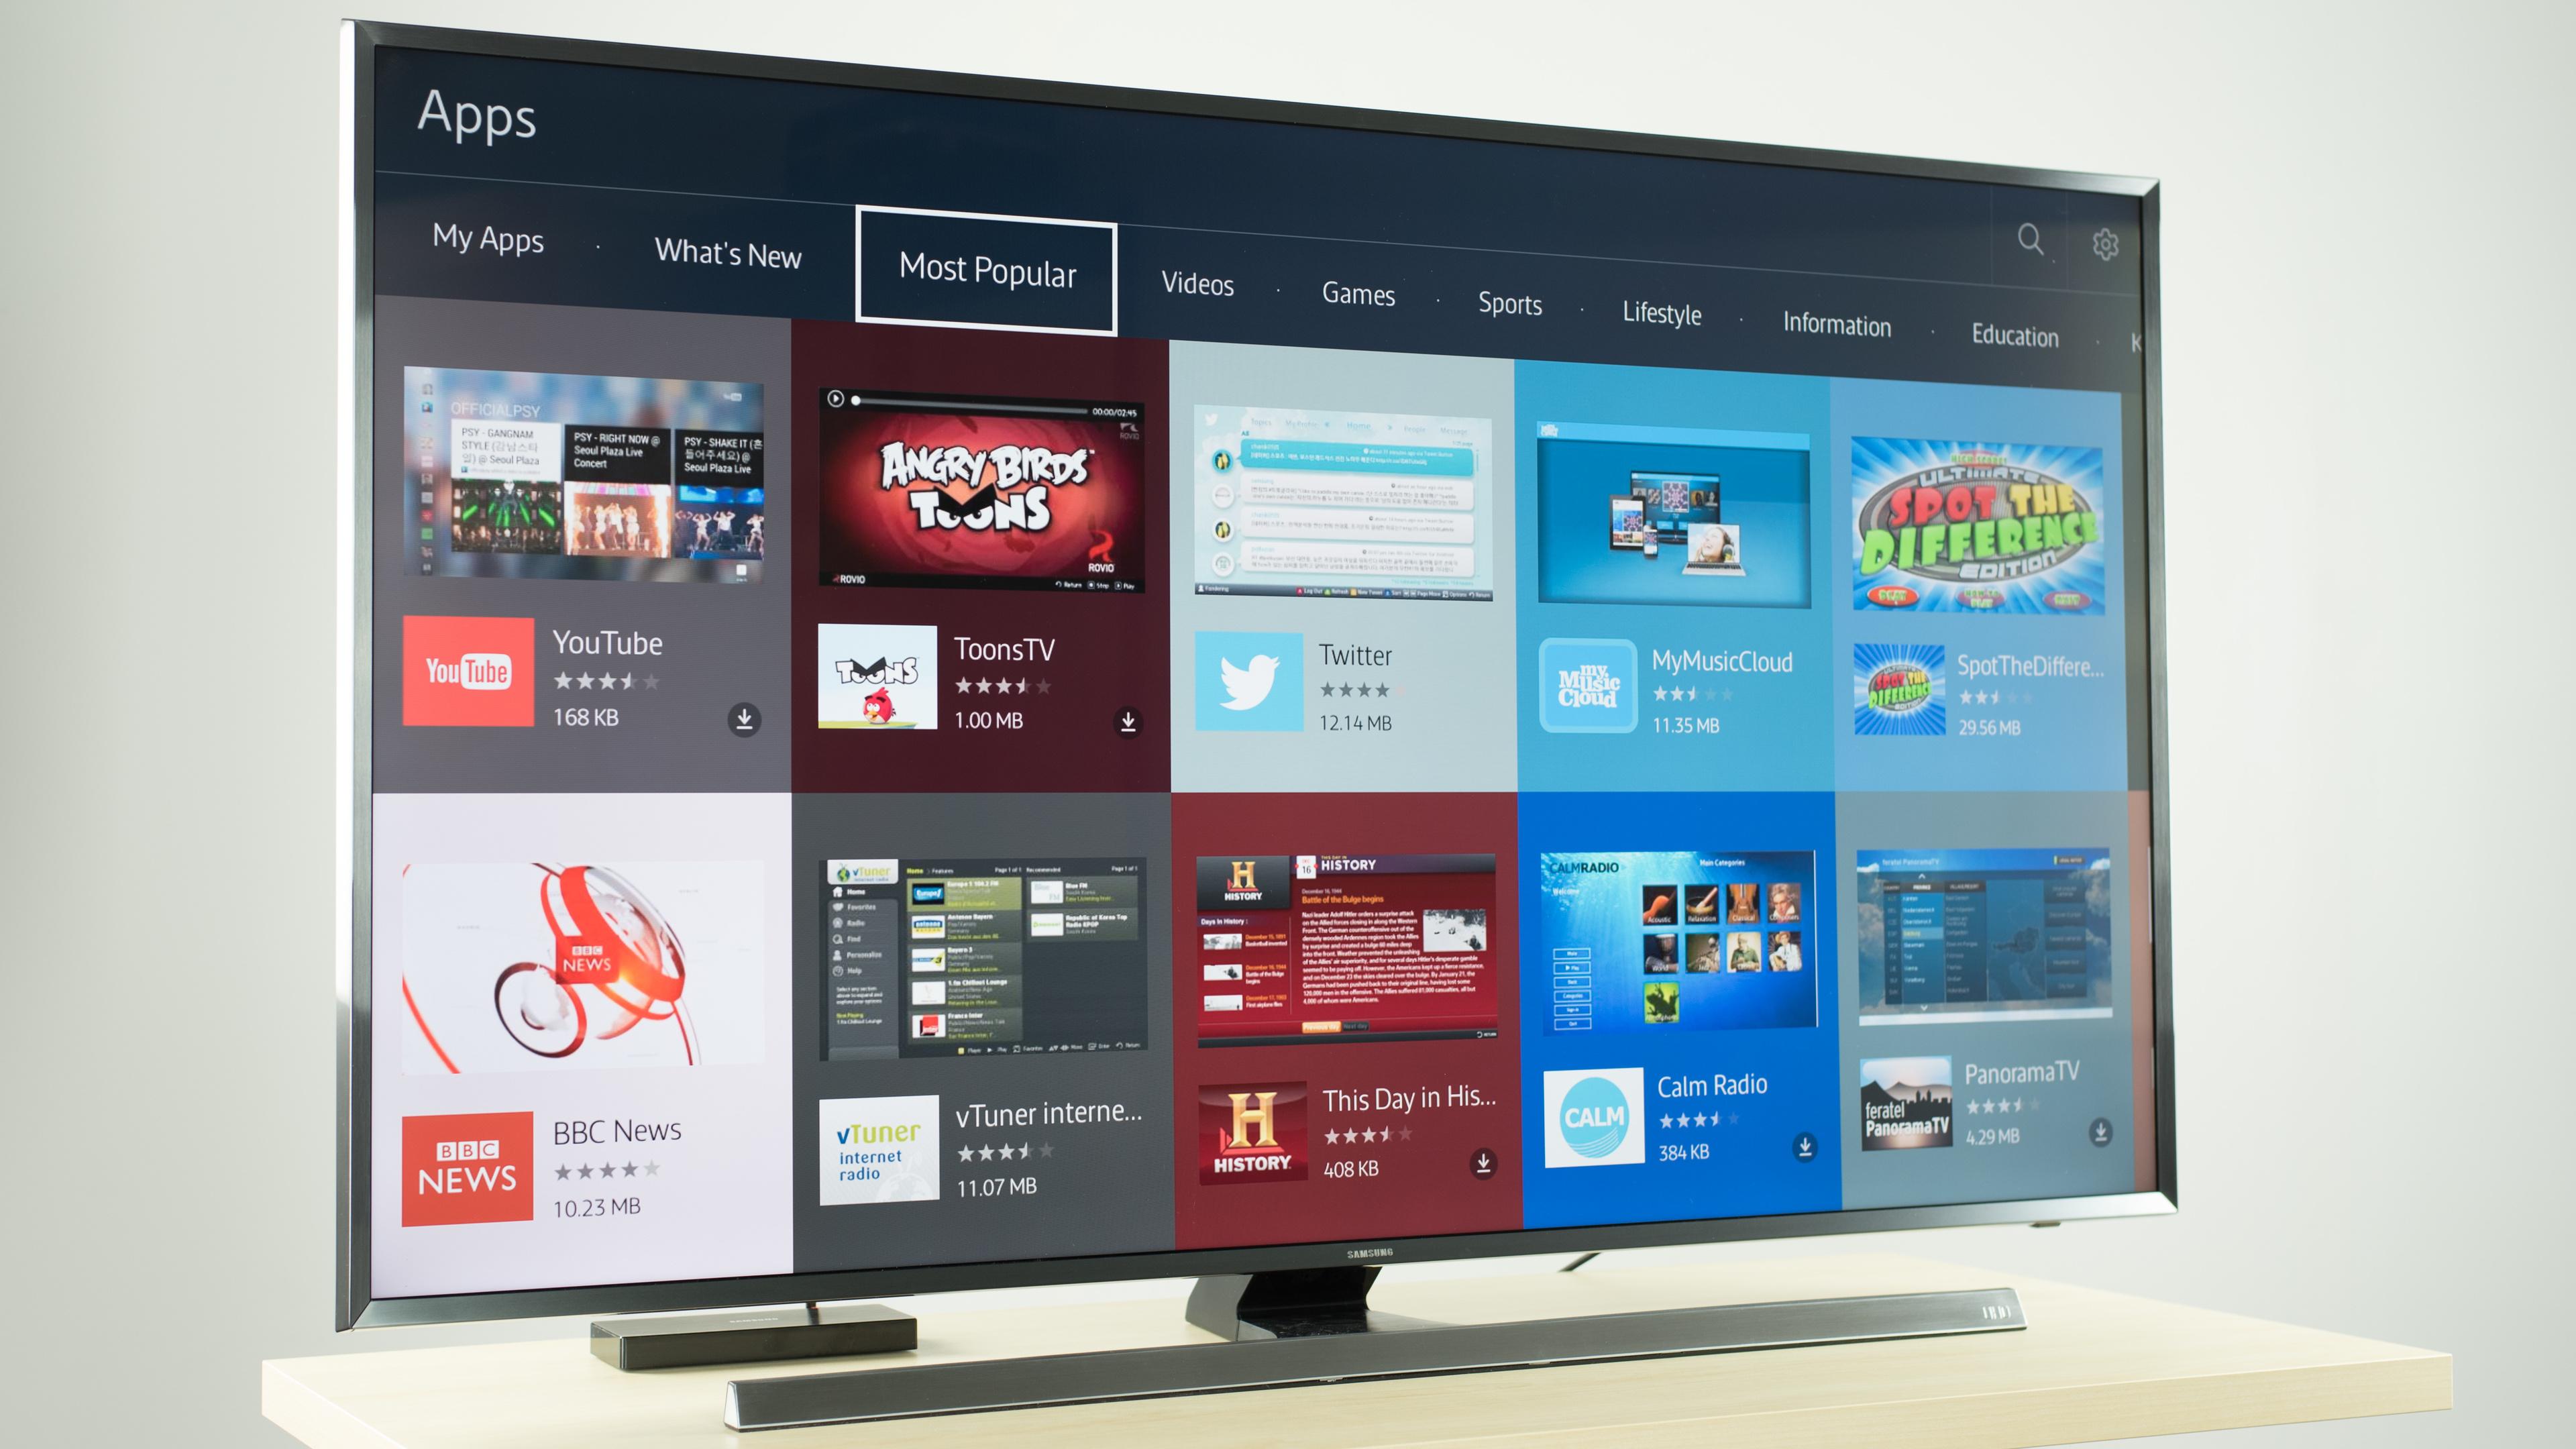 Samsung 7100 Led Tv User Manual Daily Instruction Manual Guides